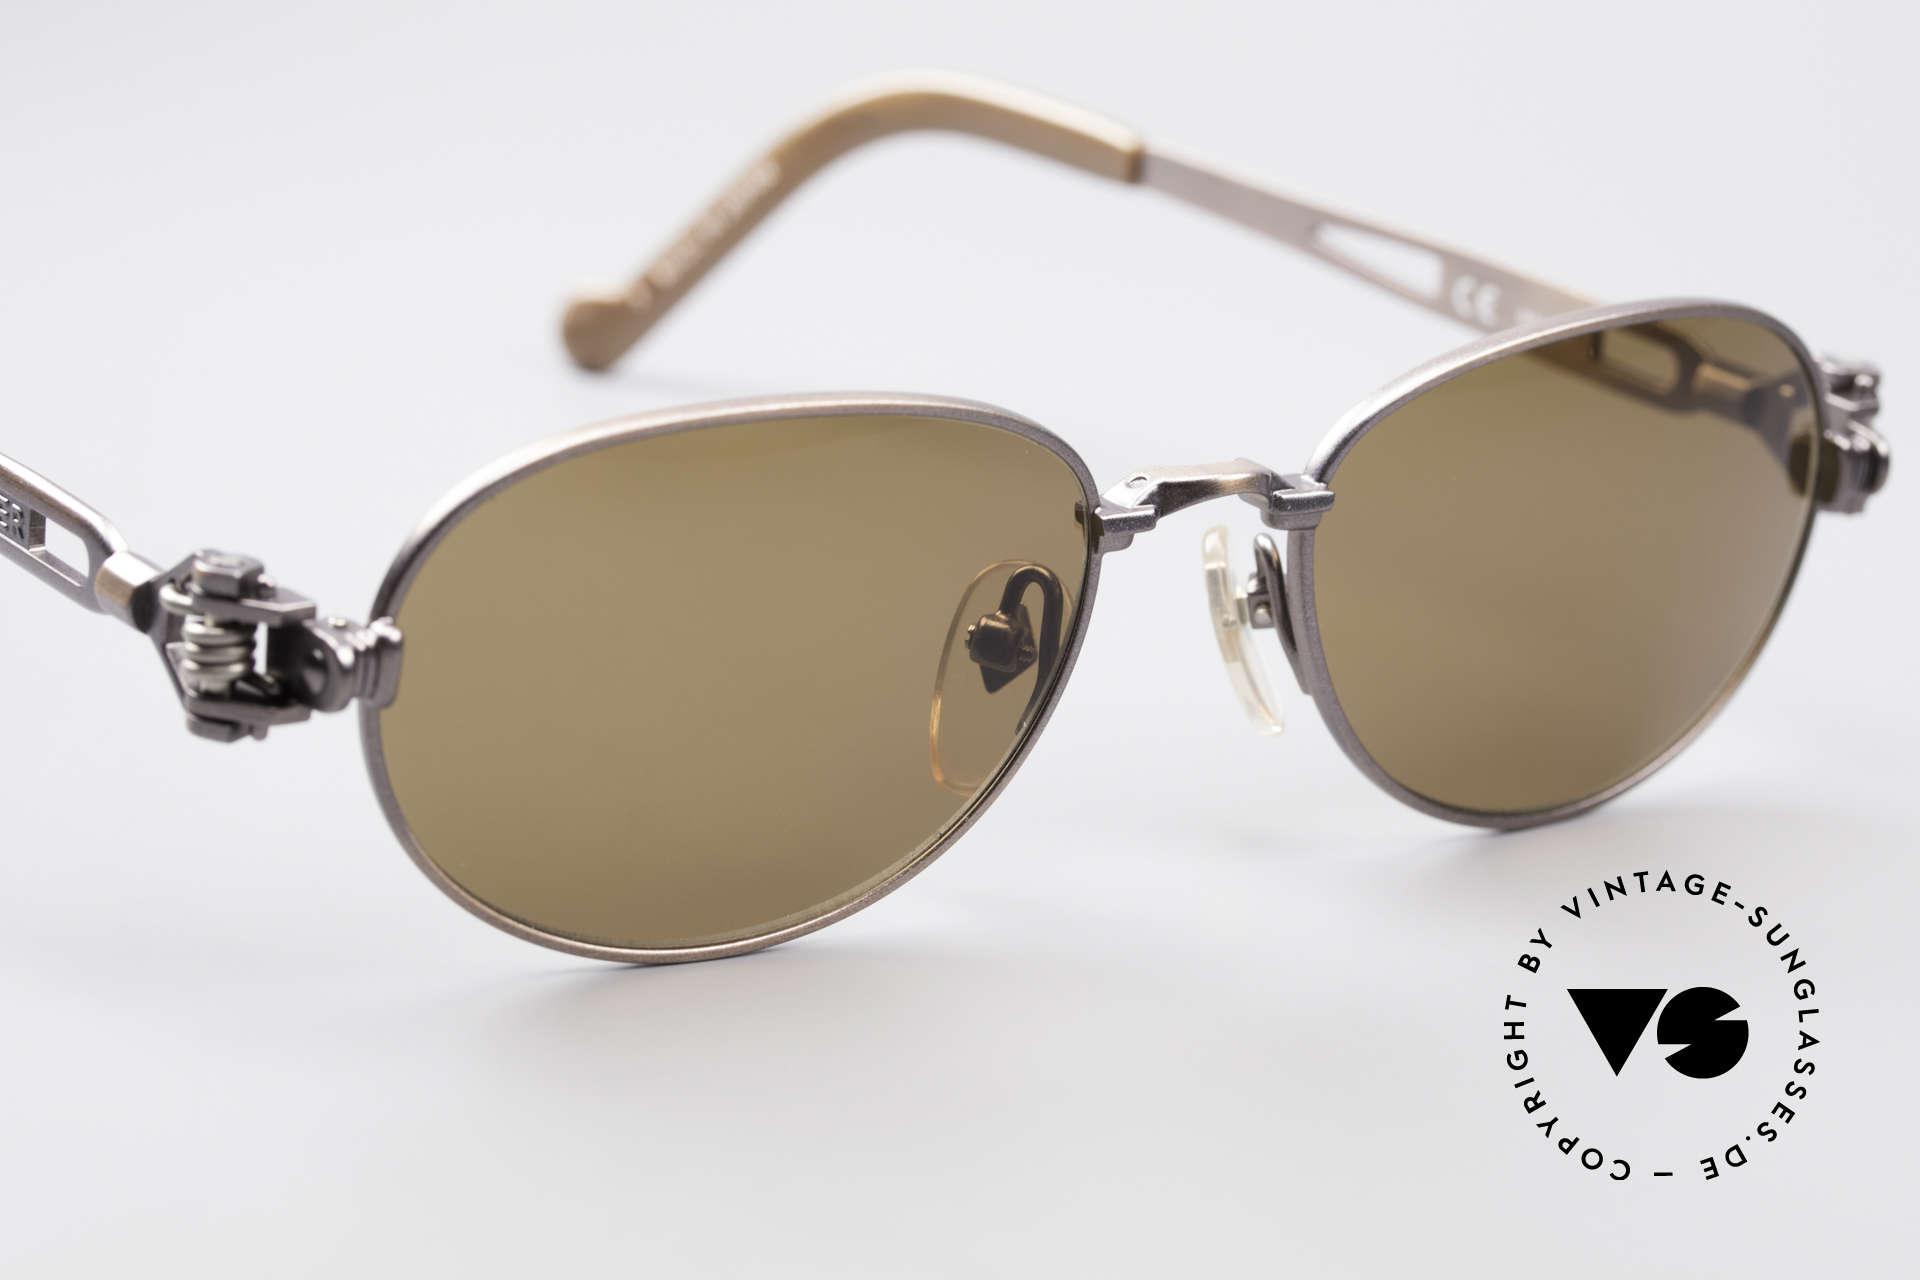 Jean Paul Gaultier 56-8102 Oval Steampunk Sunglasses, NO retro sunglasses, but a rare original from 1995, Made for Men and Women